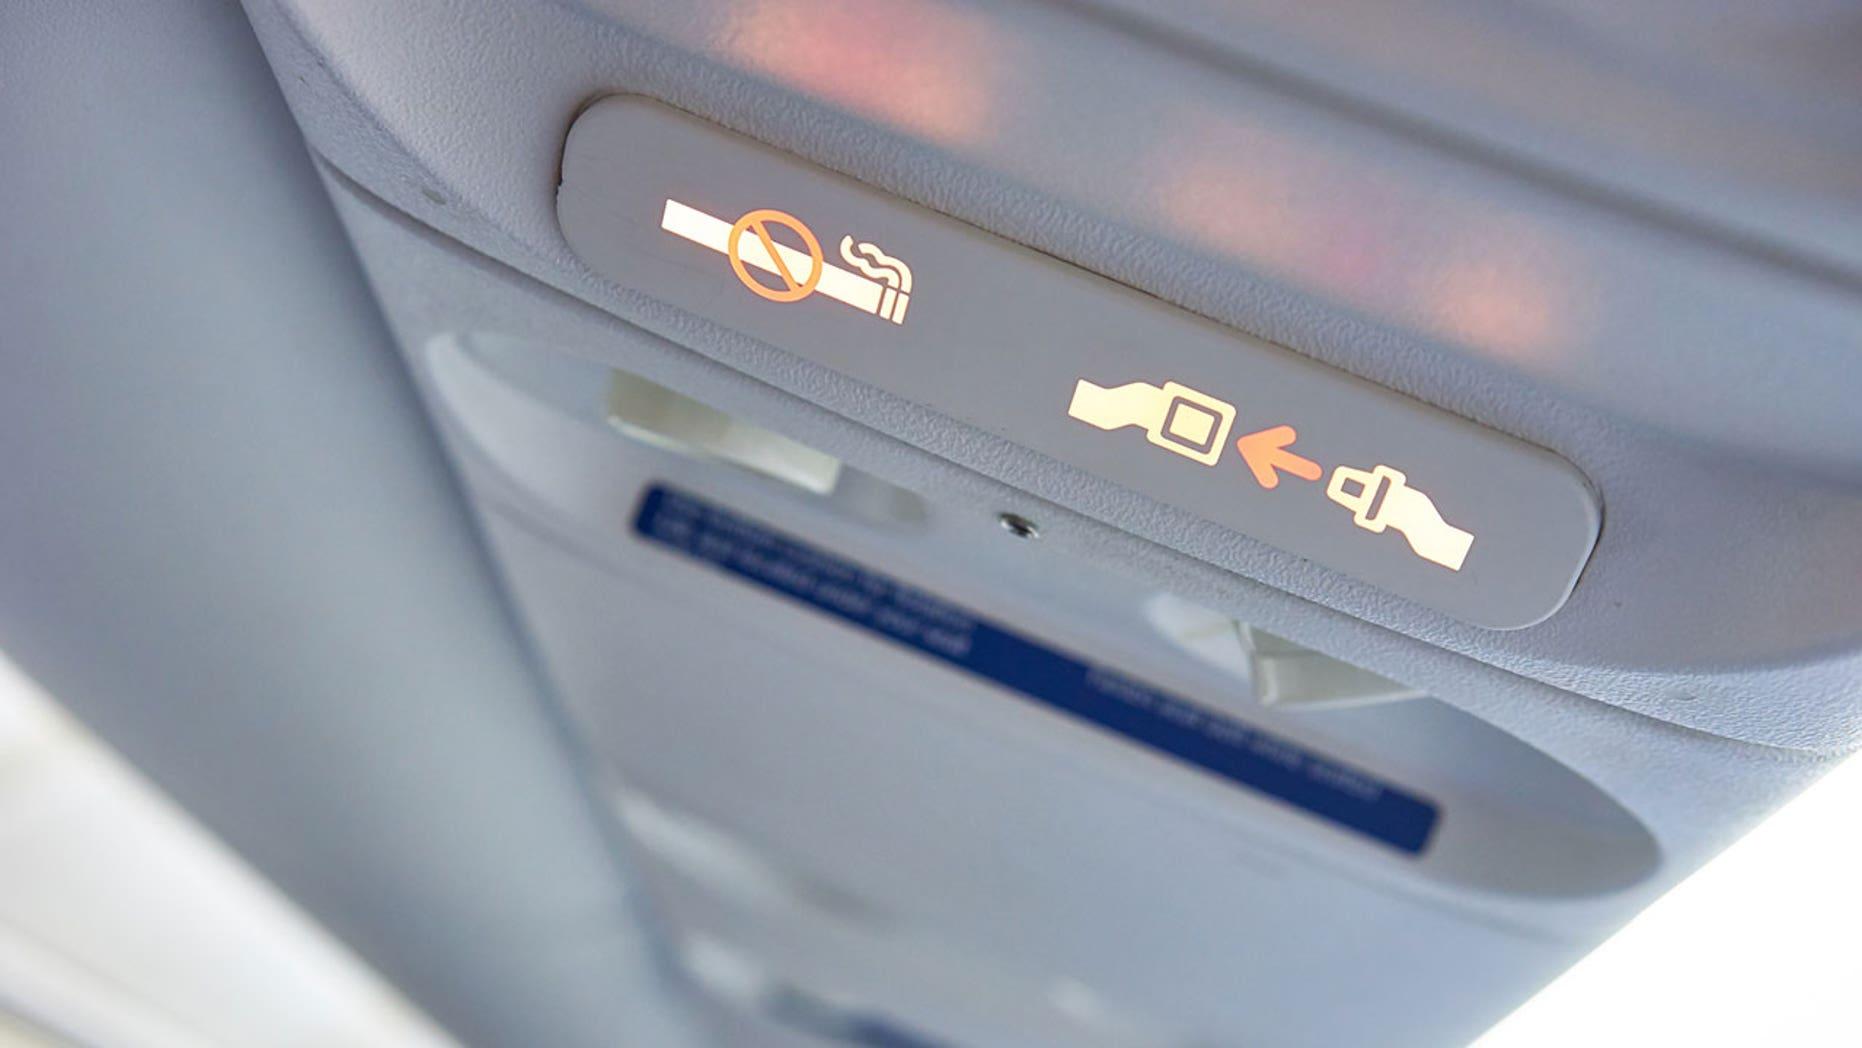 Why is the seatbelt light always illuminated?